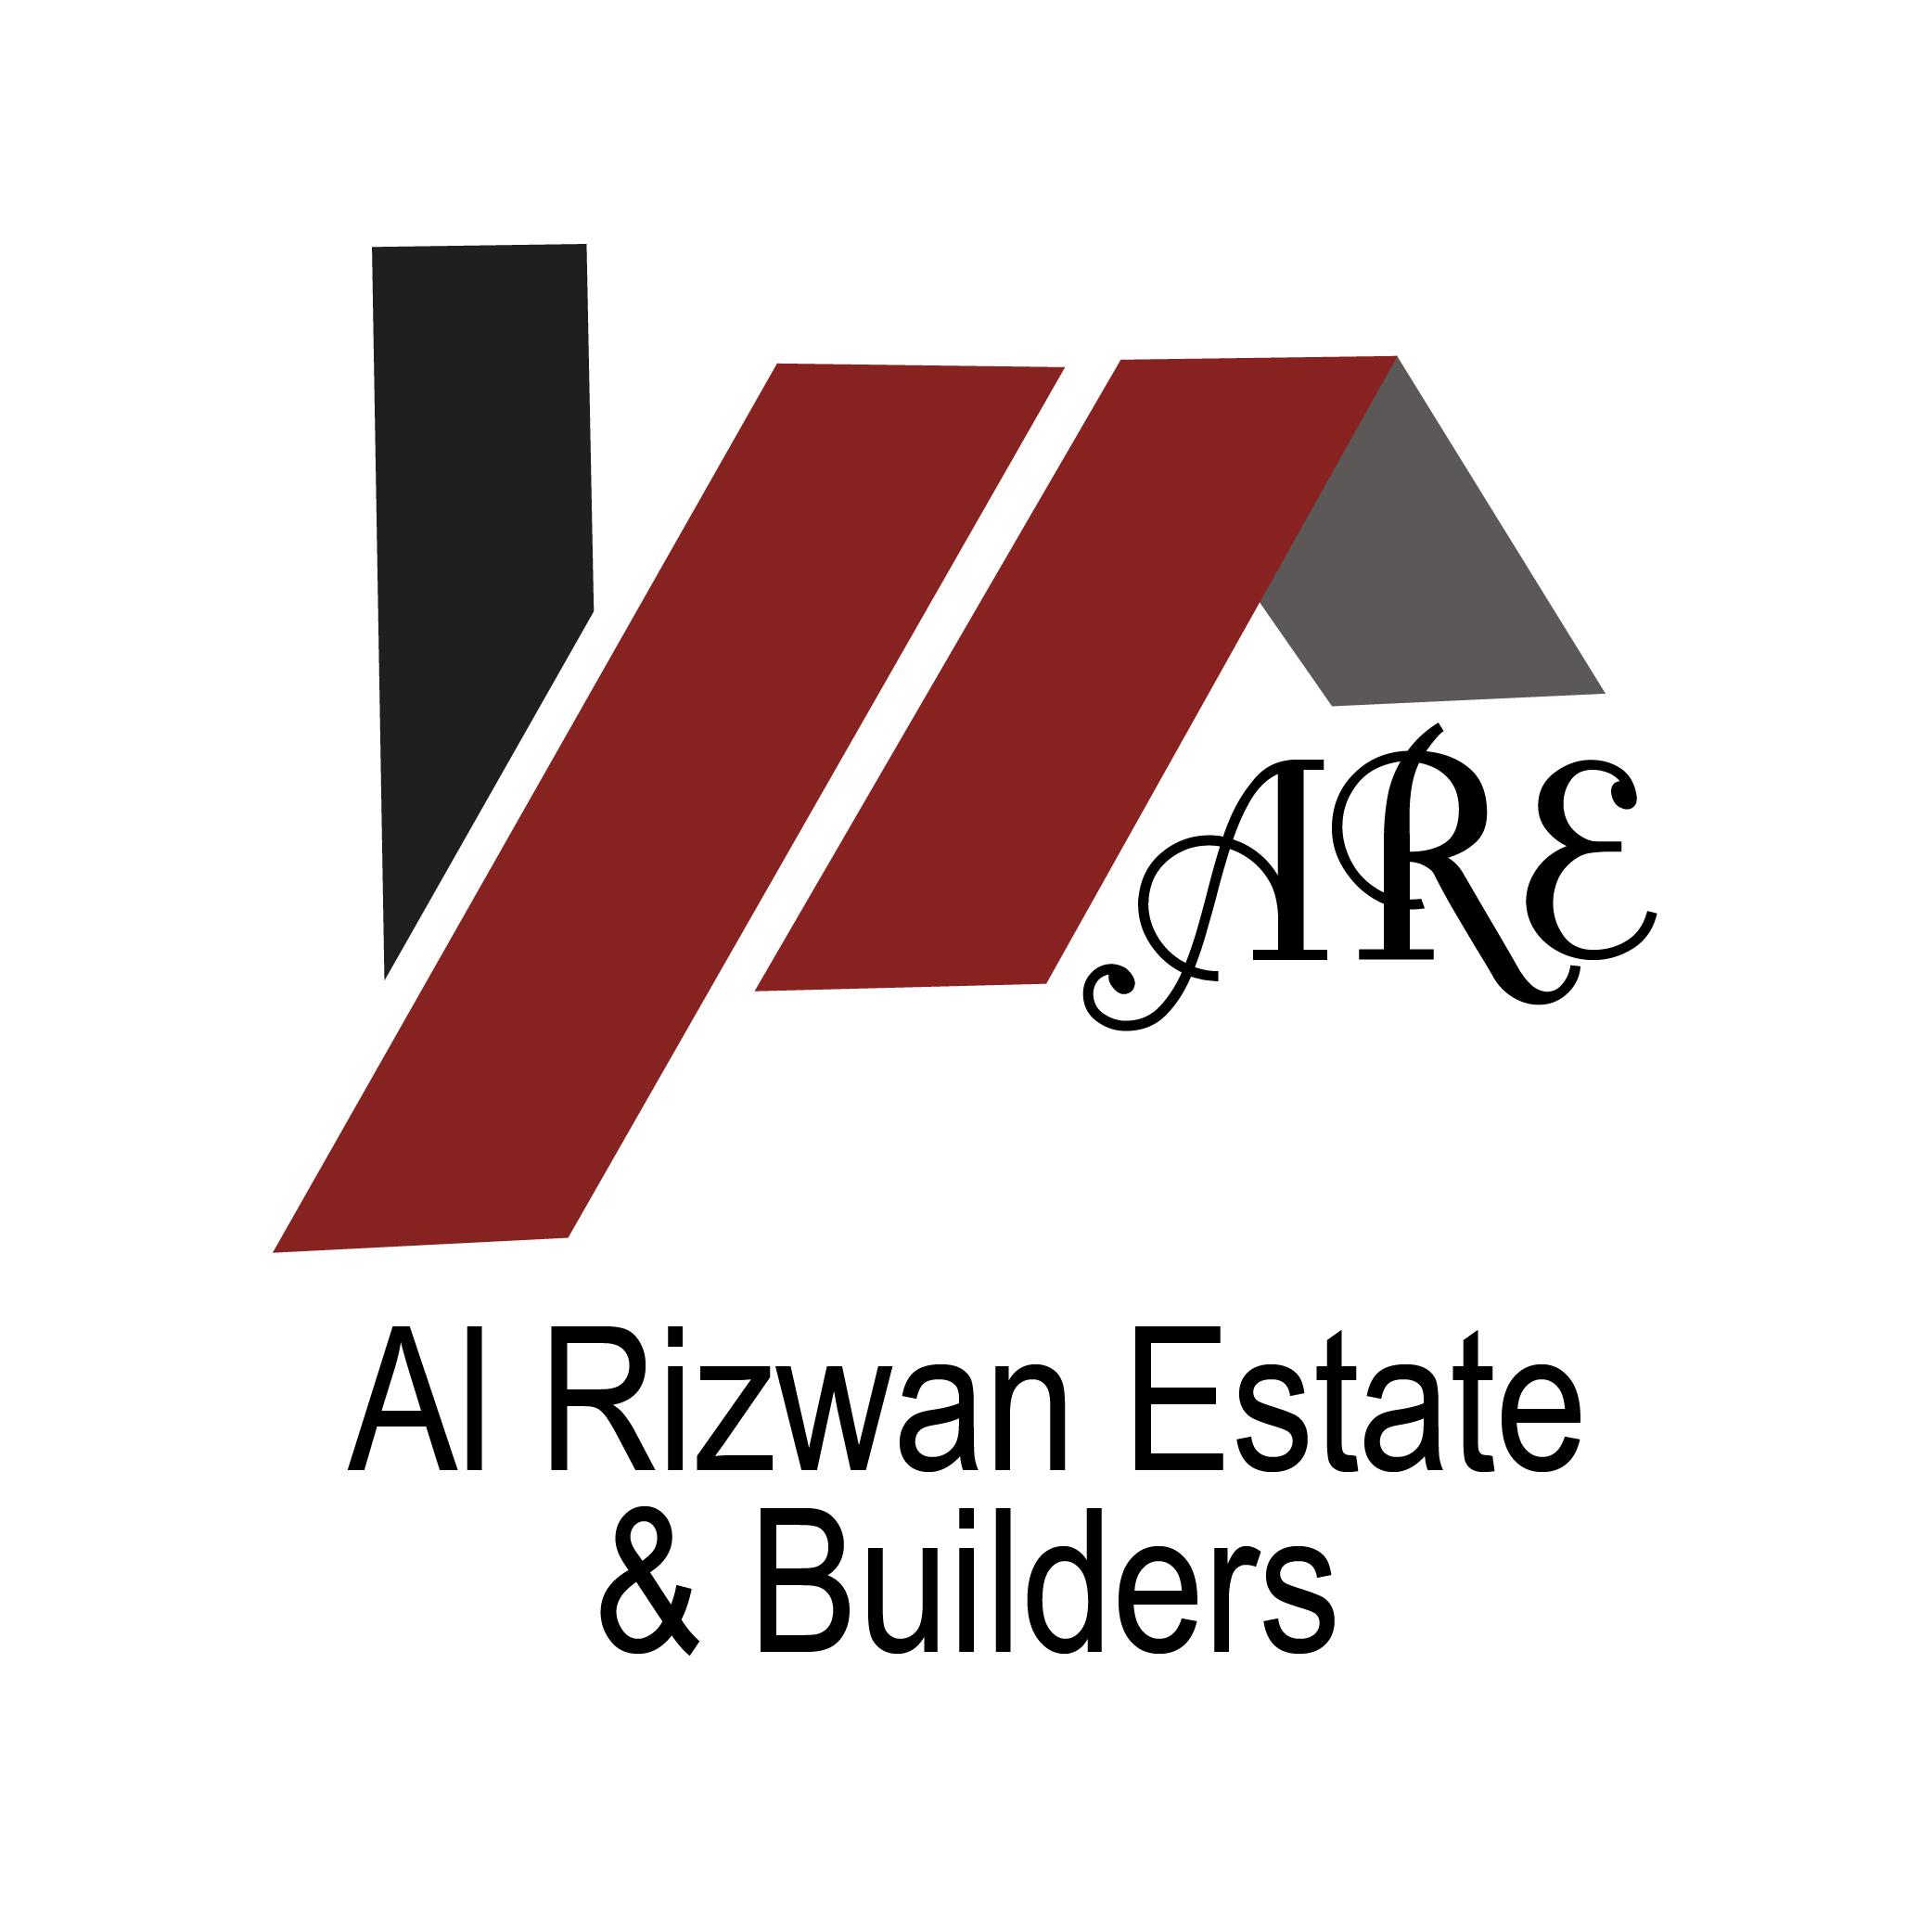 Al Rizwan Estate